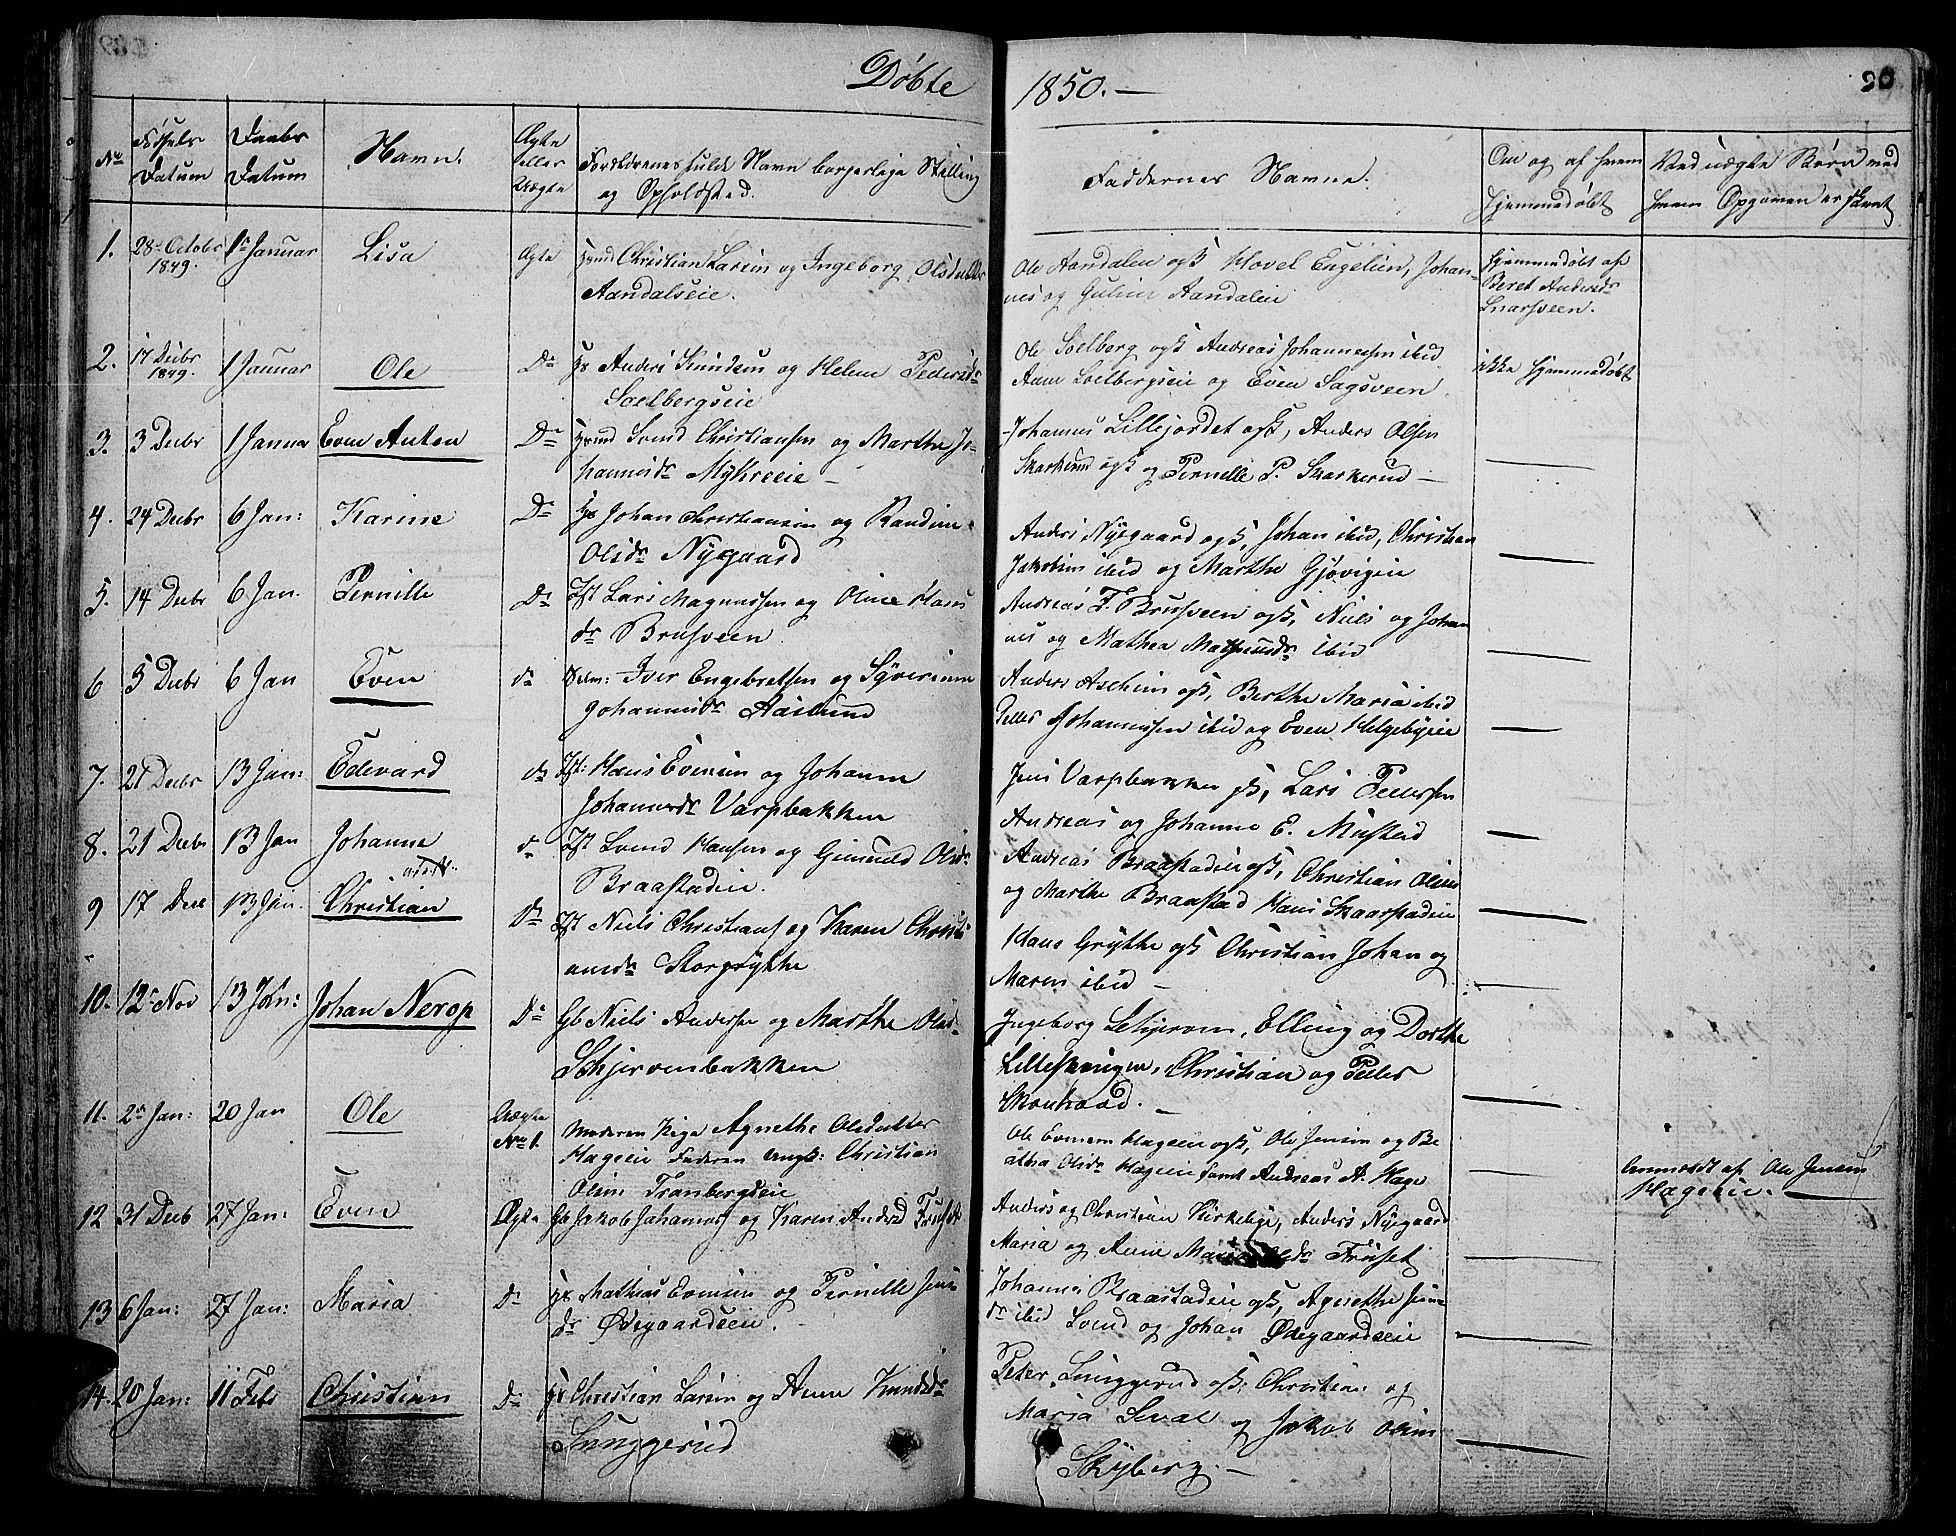 SAH, Vardal prestekontor, H/Ha/Hab/L0004: Klokkerbok nr. 4, 1831-1853, s. 90